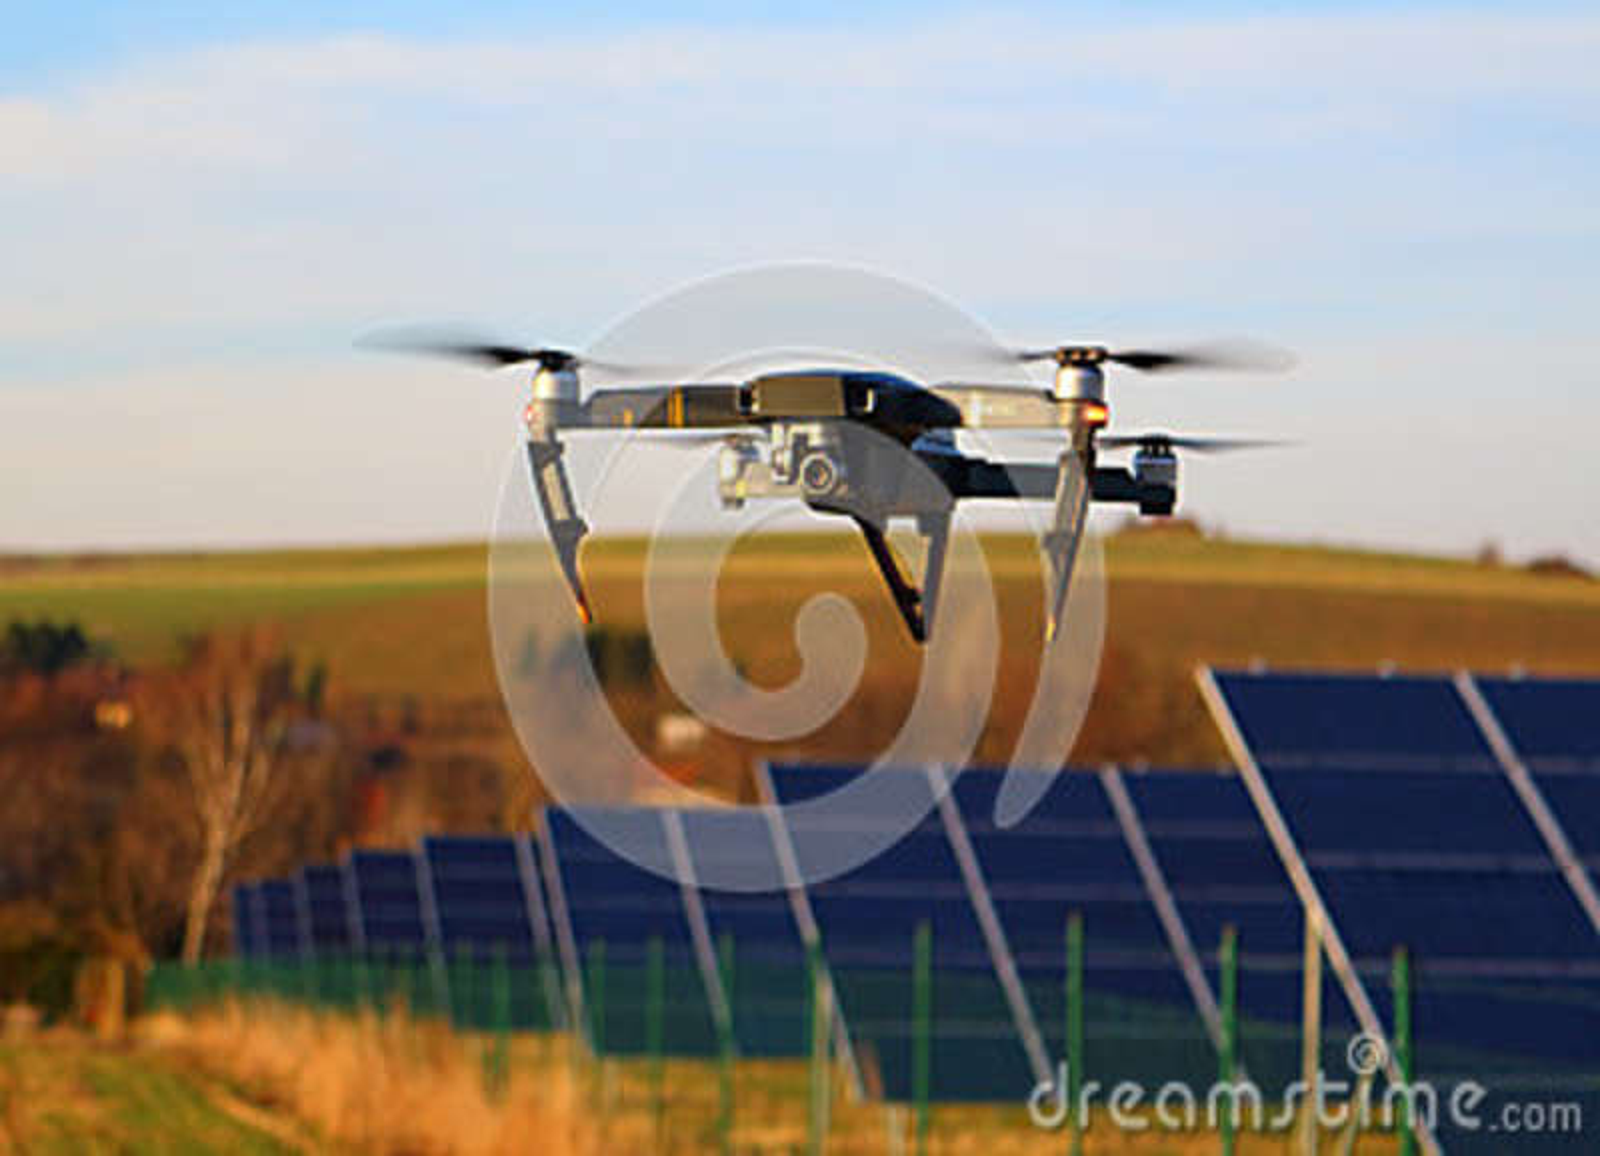 DJI Mavic Pro drone editorial photo  Image of energy - 89478786